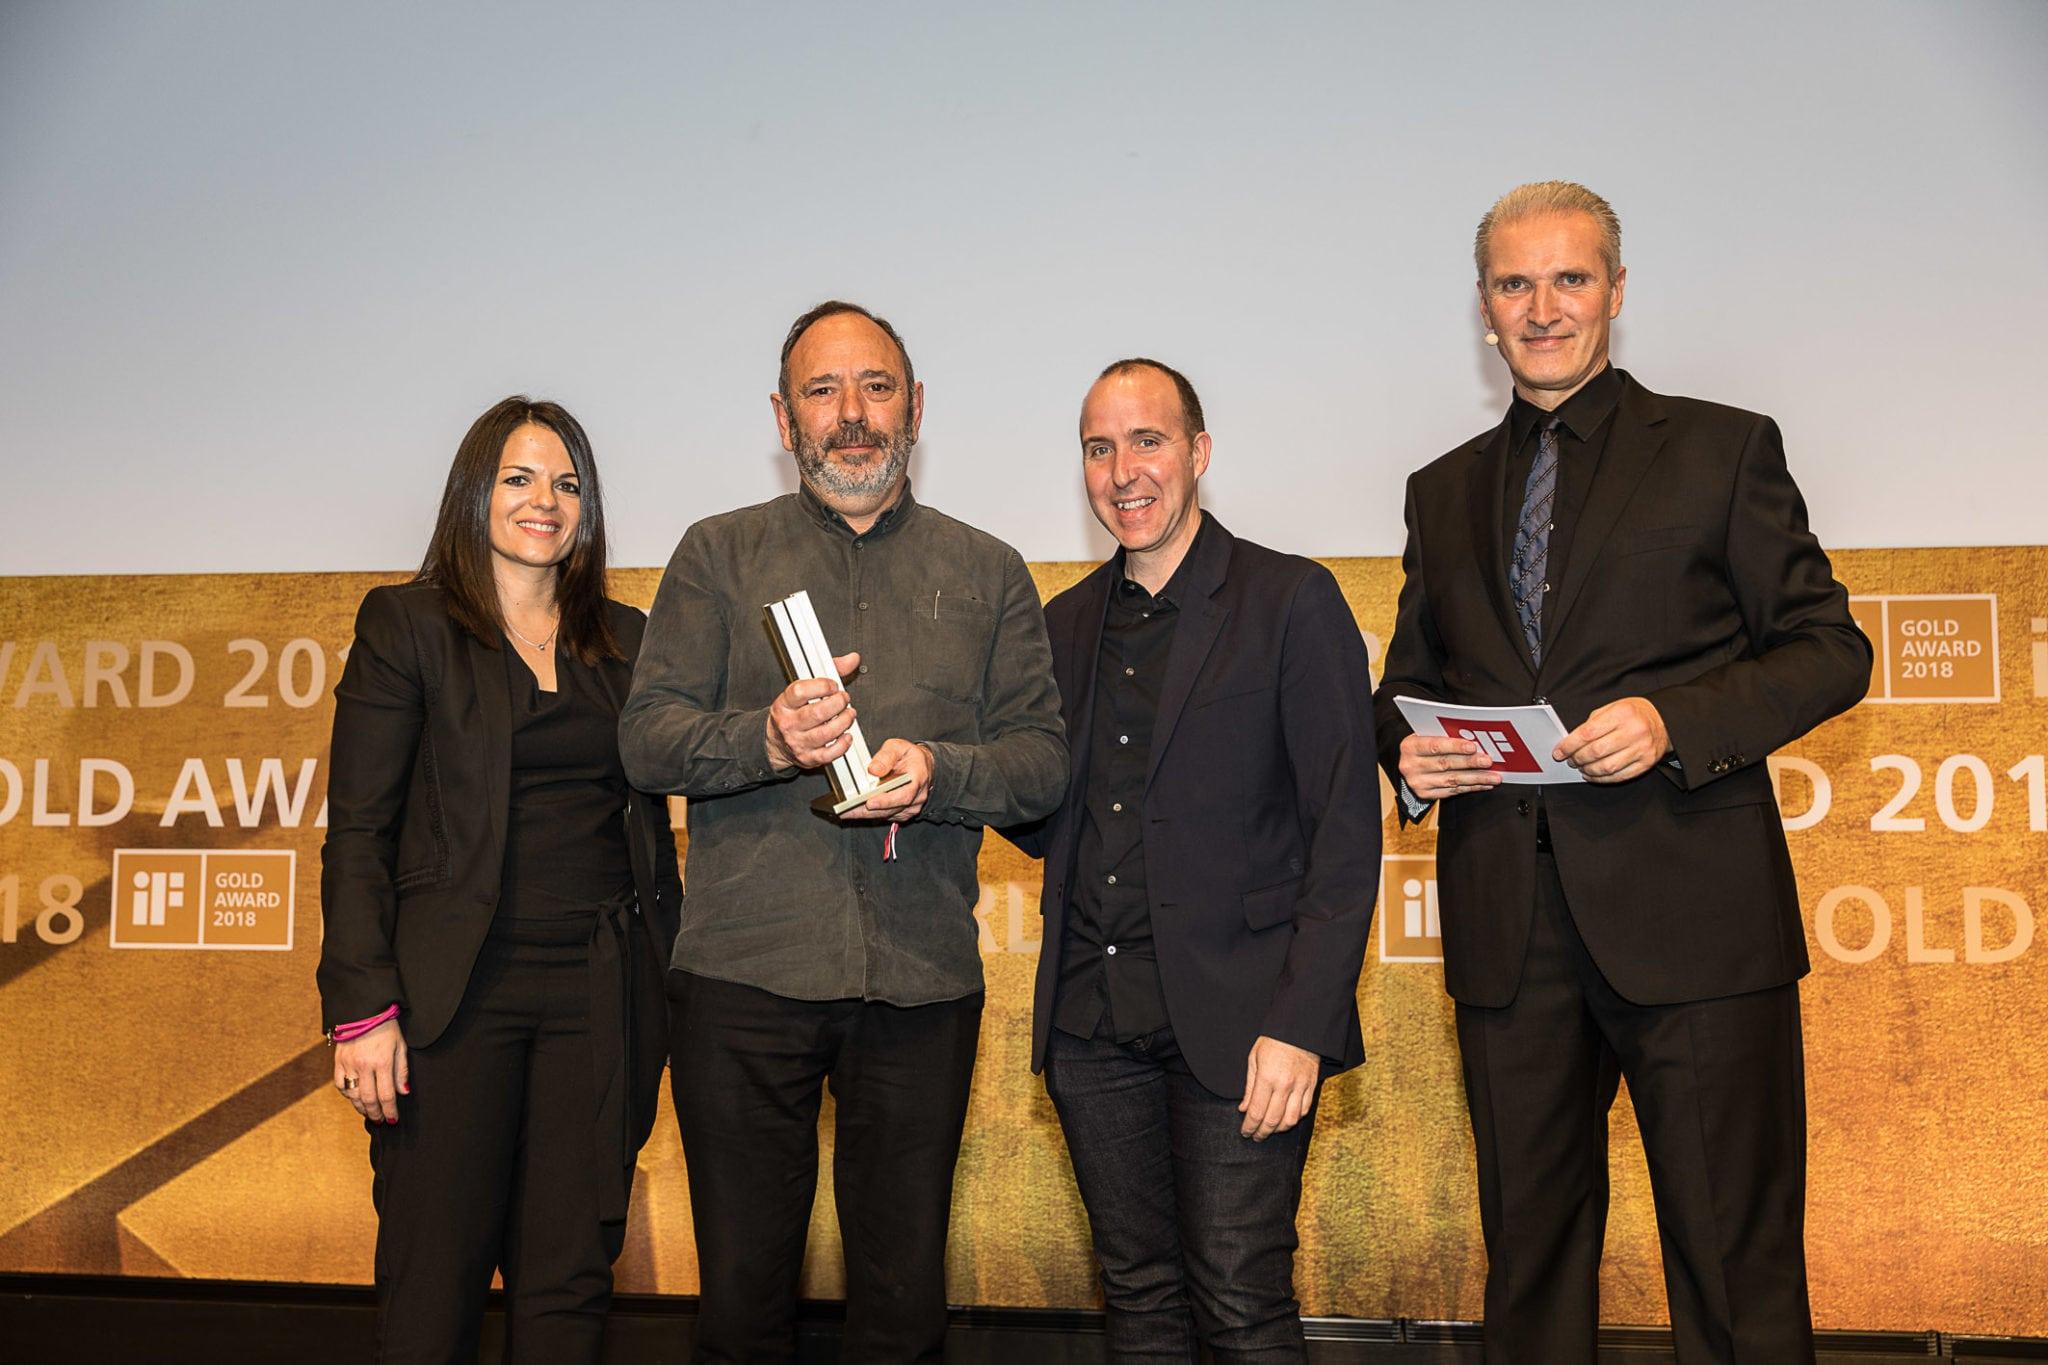 simon Anna Ferrer, Brand Manager de Fluvia, el diseñador Antoni Arola, y Salvi Plaja, director de diseño de Simon recogieron el premio iF Gold Award.